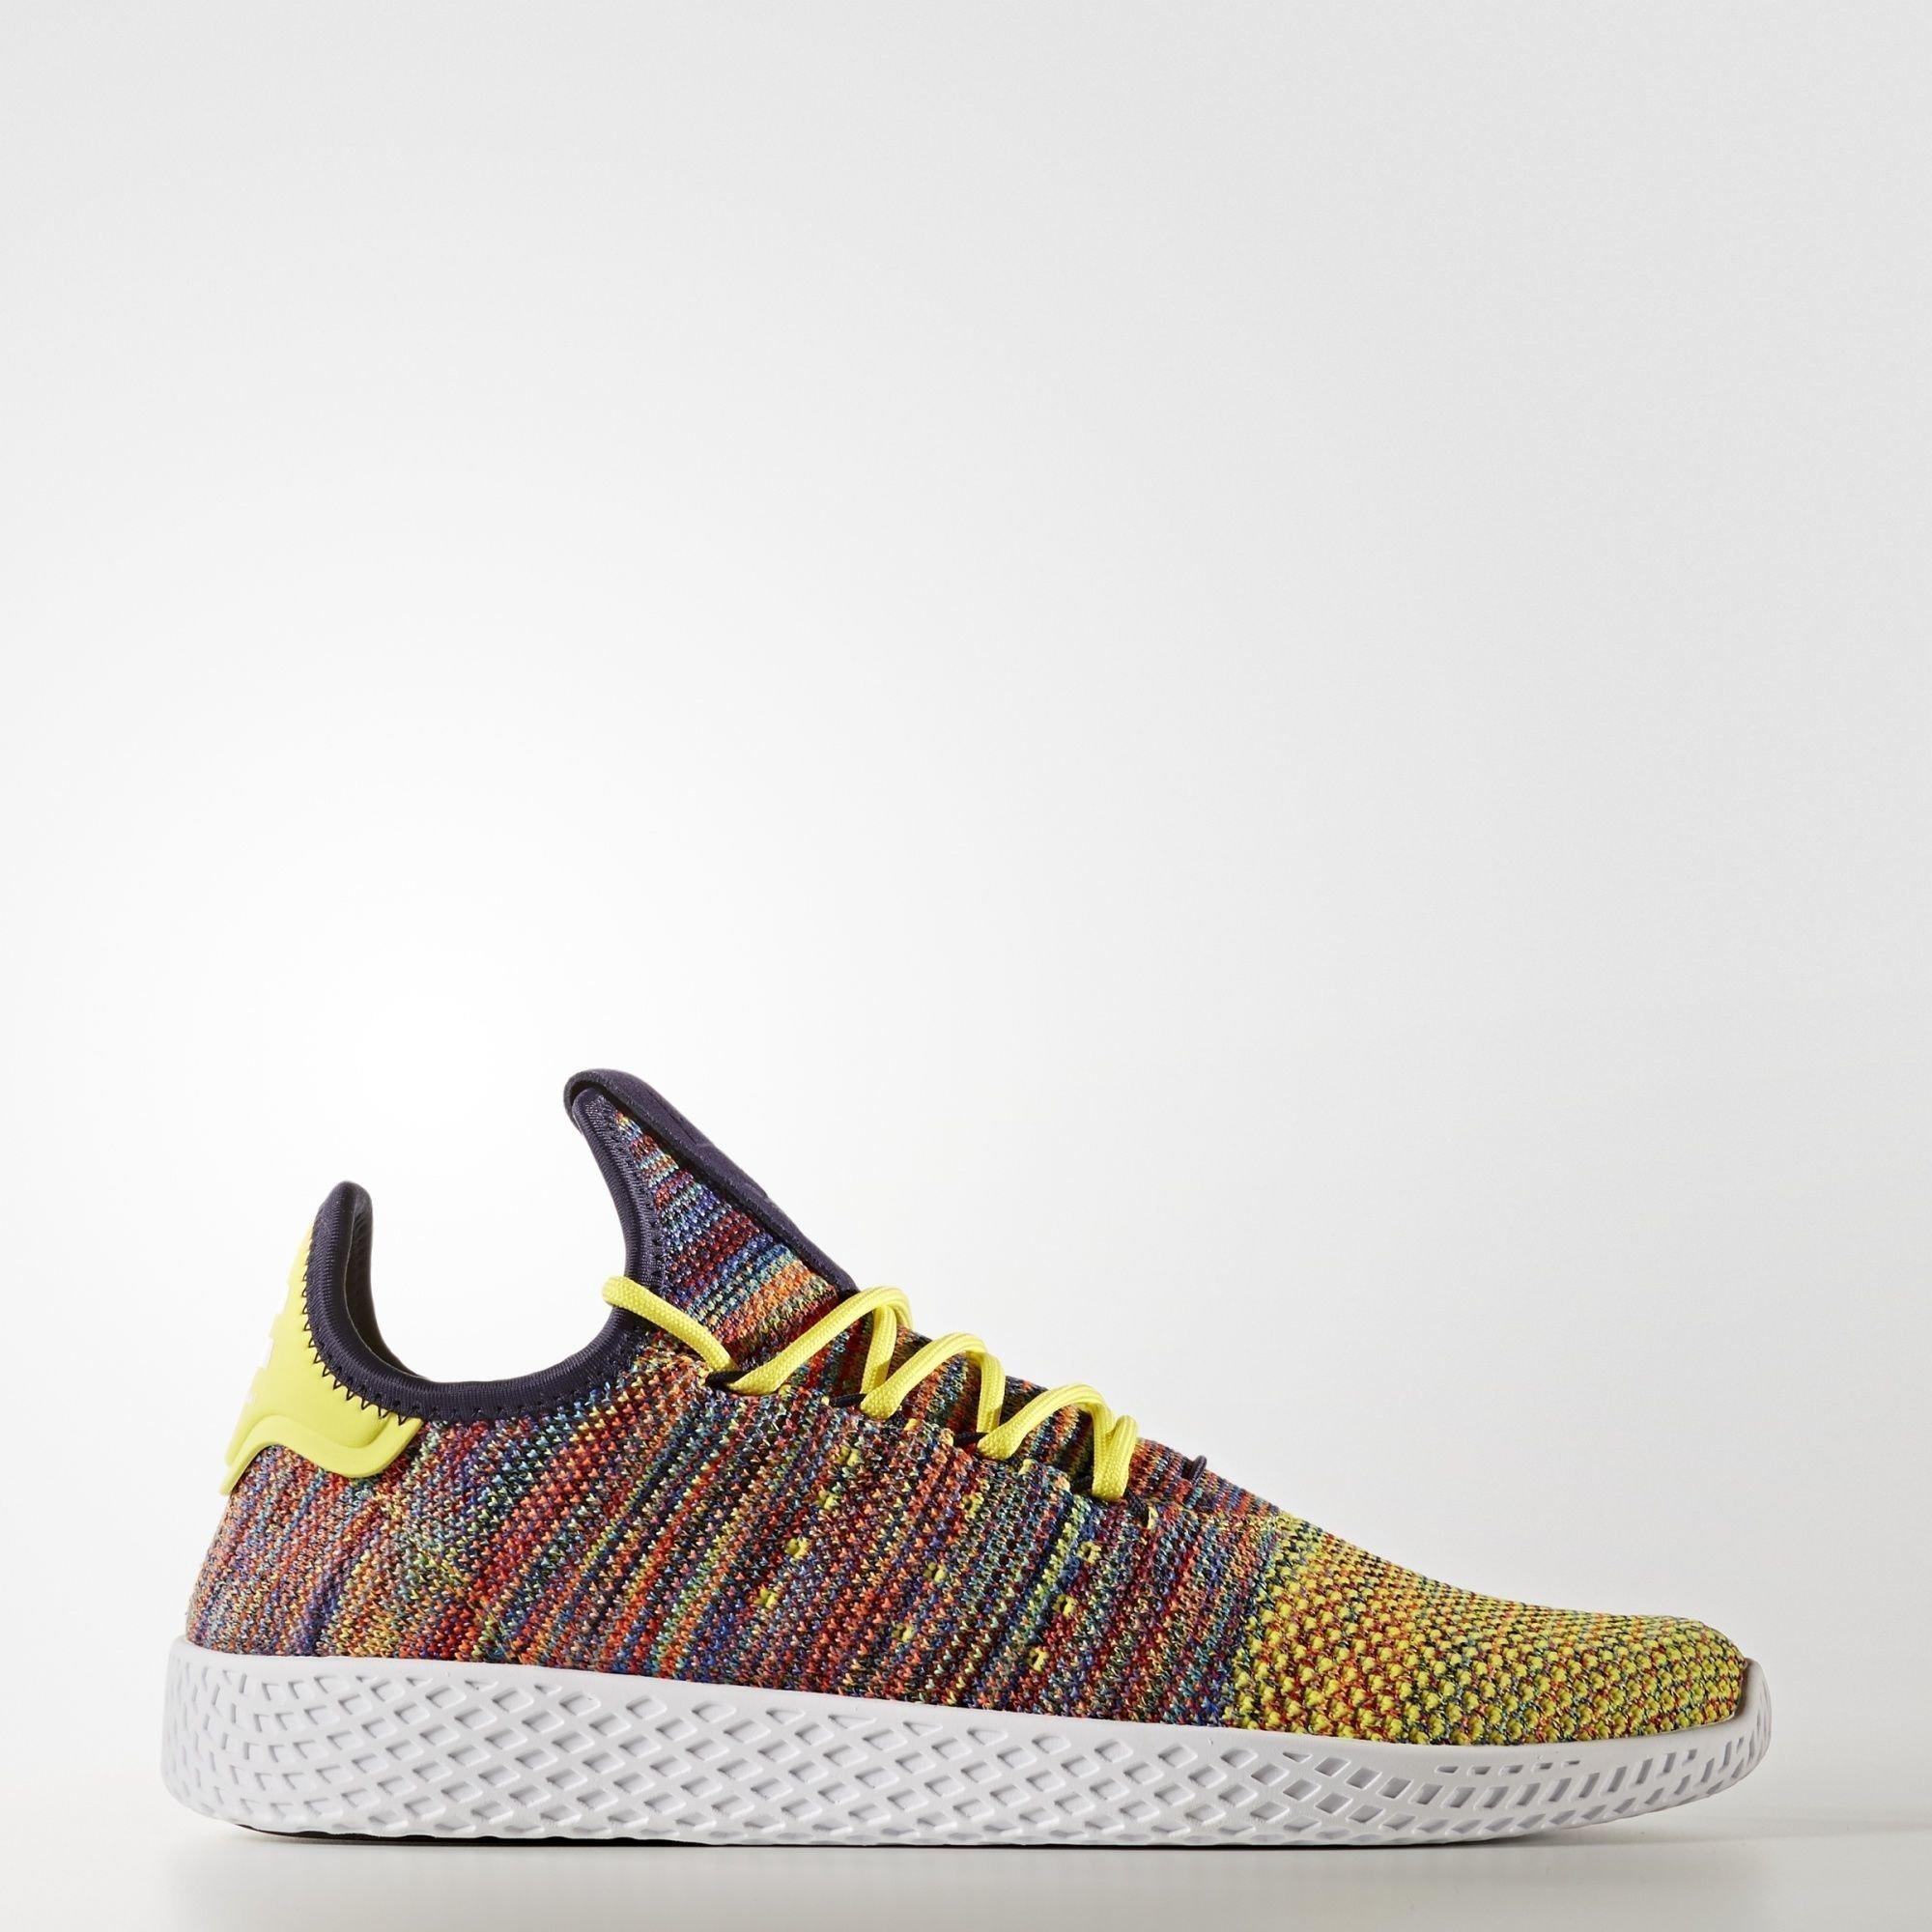 Pharrell x adidas Tennis HU Multi (BY2673)